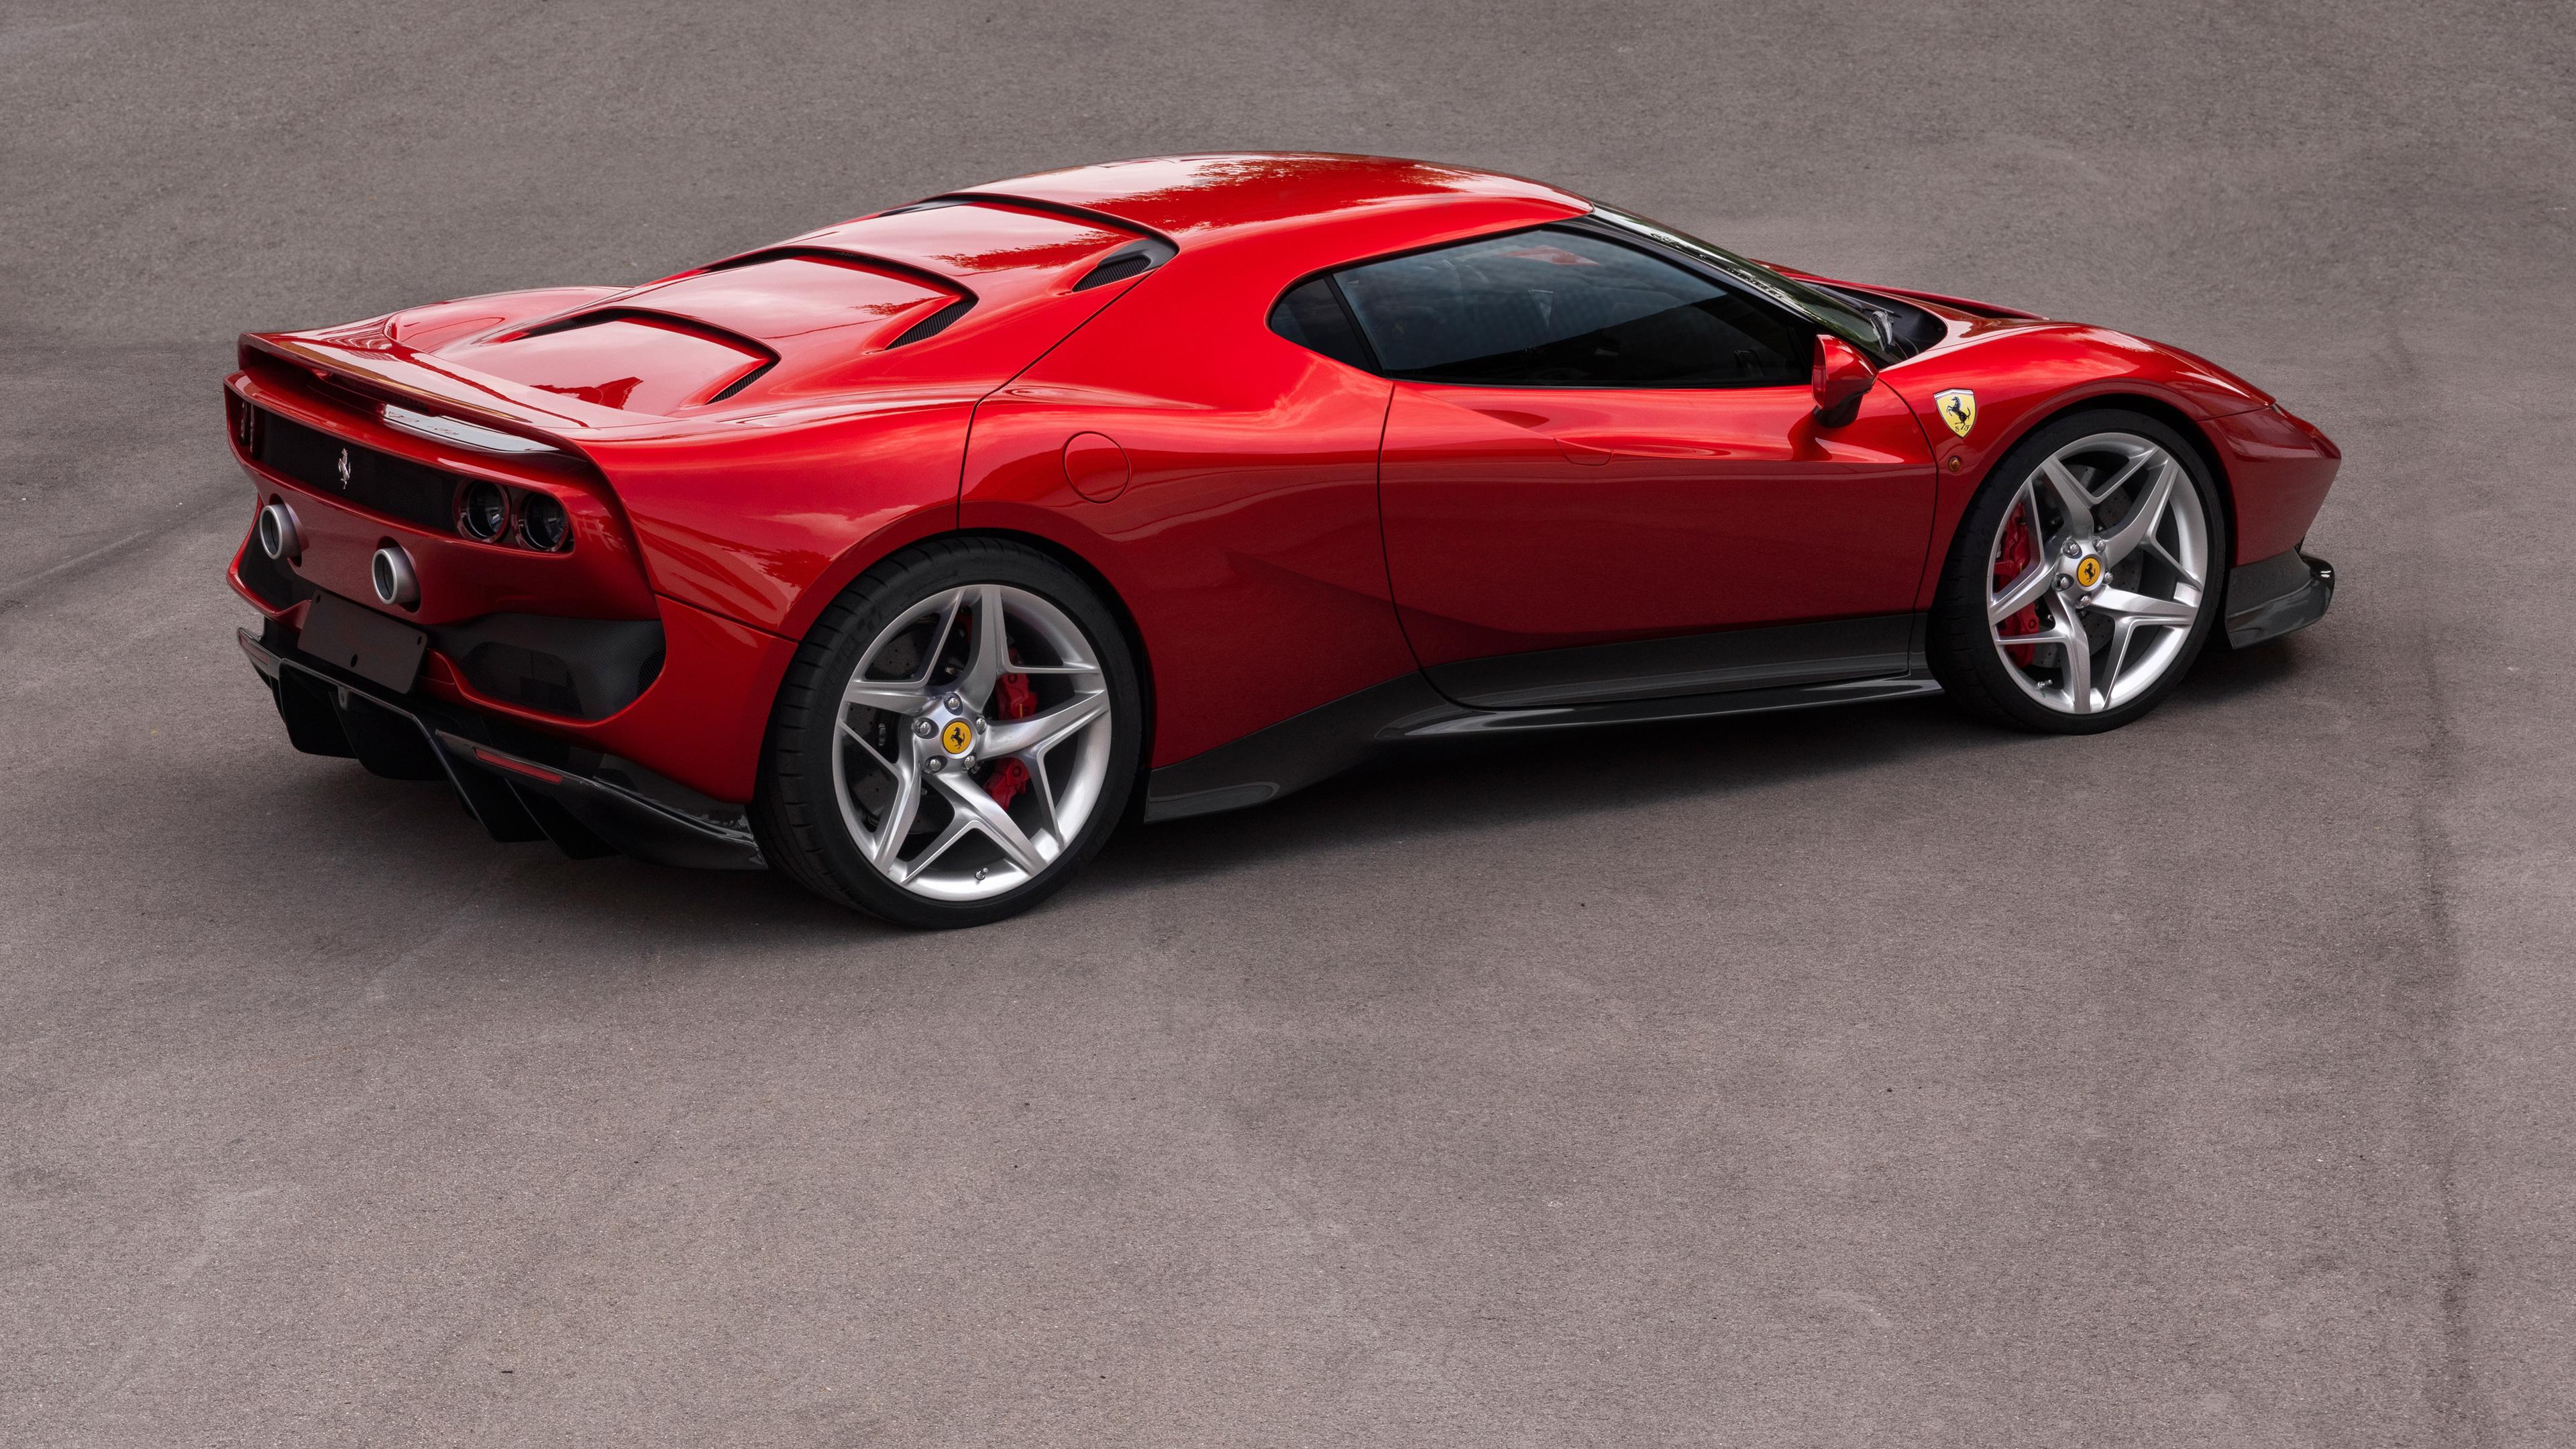 ferrari sp 38 1539111495 - Ferrari SP 38 - hd-wallpapers, ferrari wallpapers, ferrari sp38 wallpapers, cars wallpapers, 4k-wallpapers, 2018 cars wallpapers